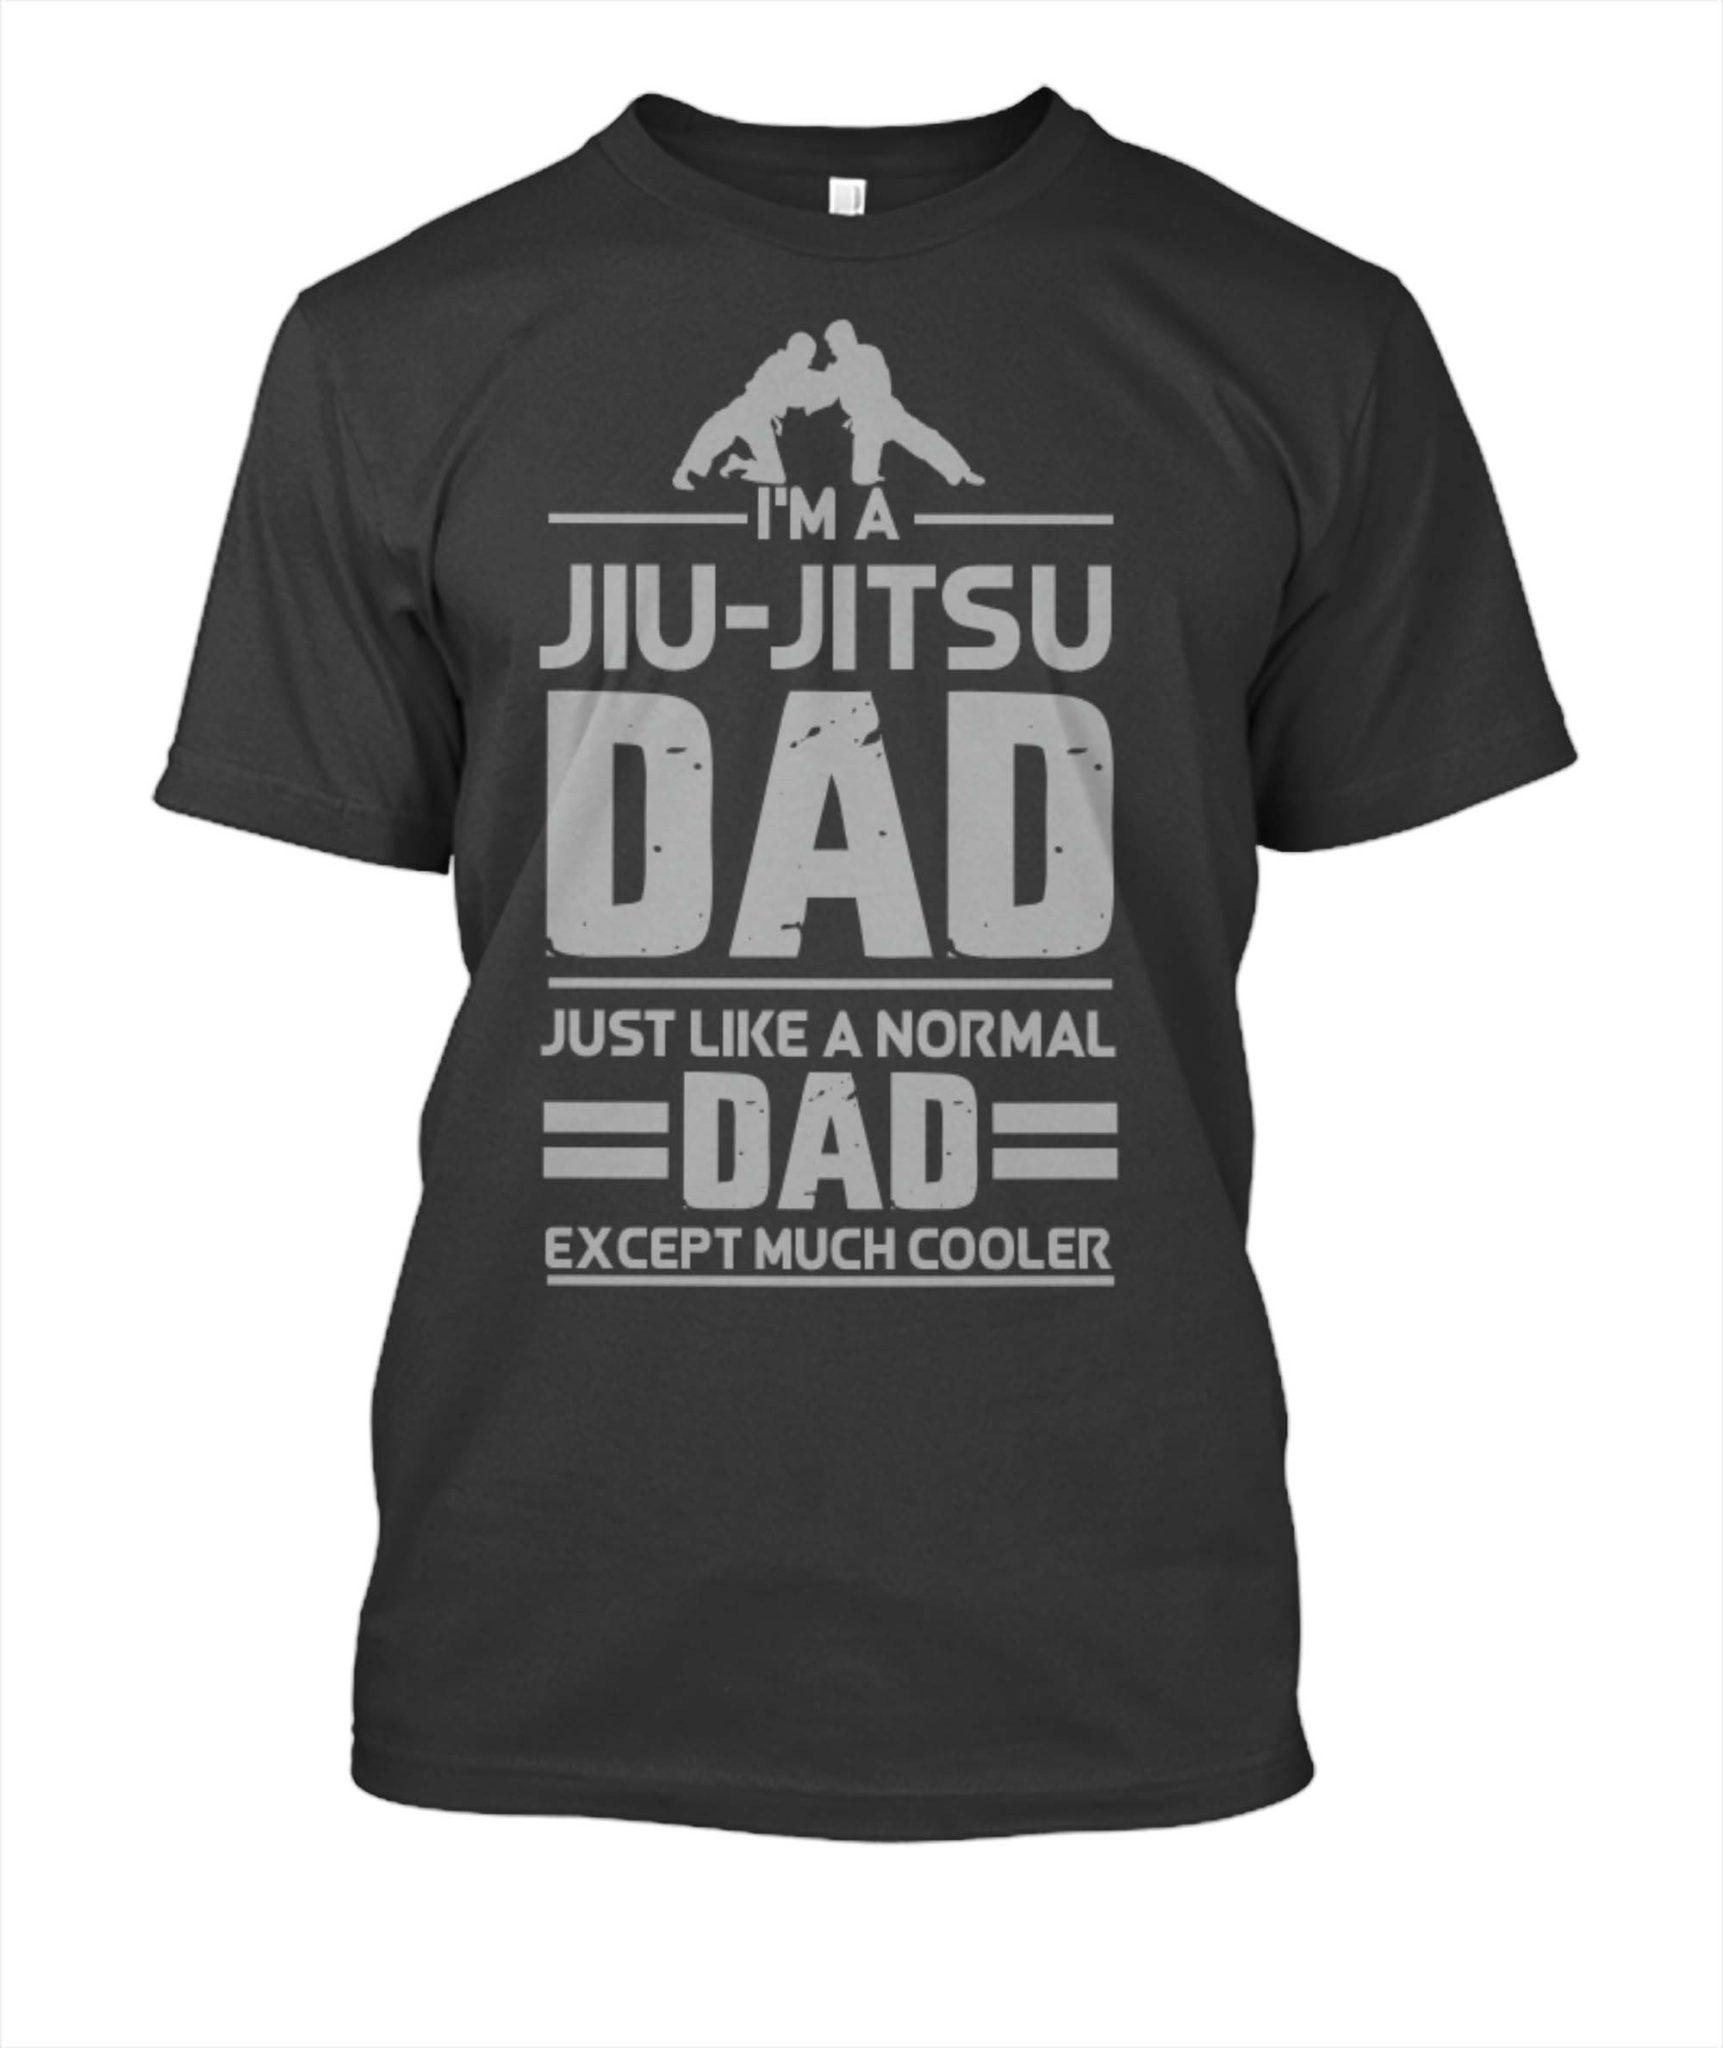 d08e7a8e Jiu-Jitsu Dad T-Shirt – Second Skin Sports